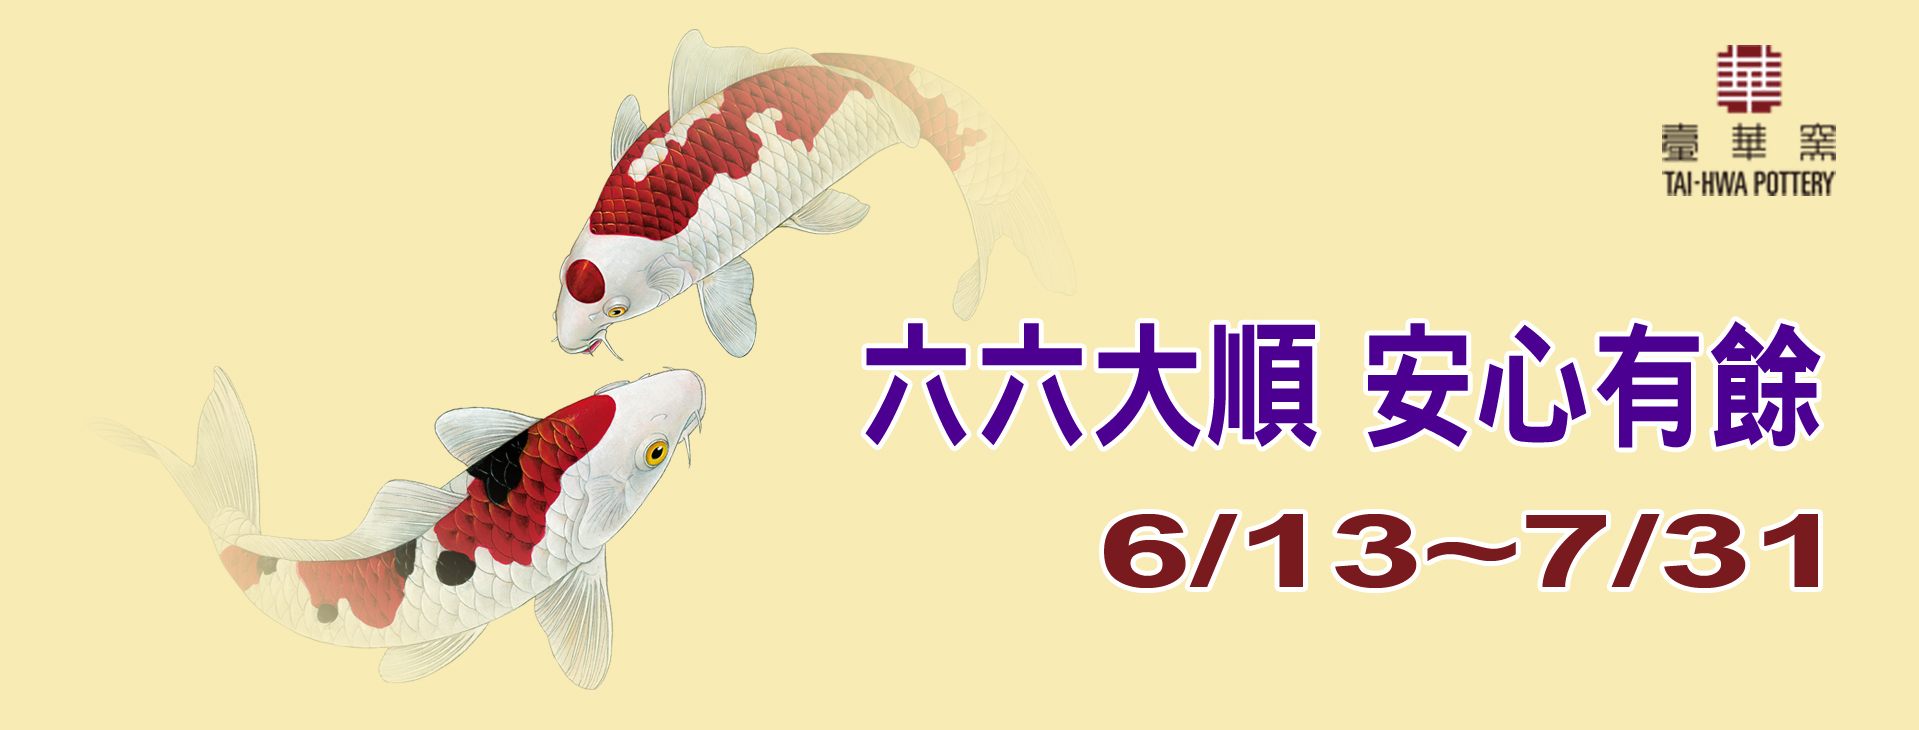 catalog/product/2020/202006/202006安心六部曲1921-730.jpg